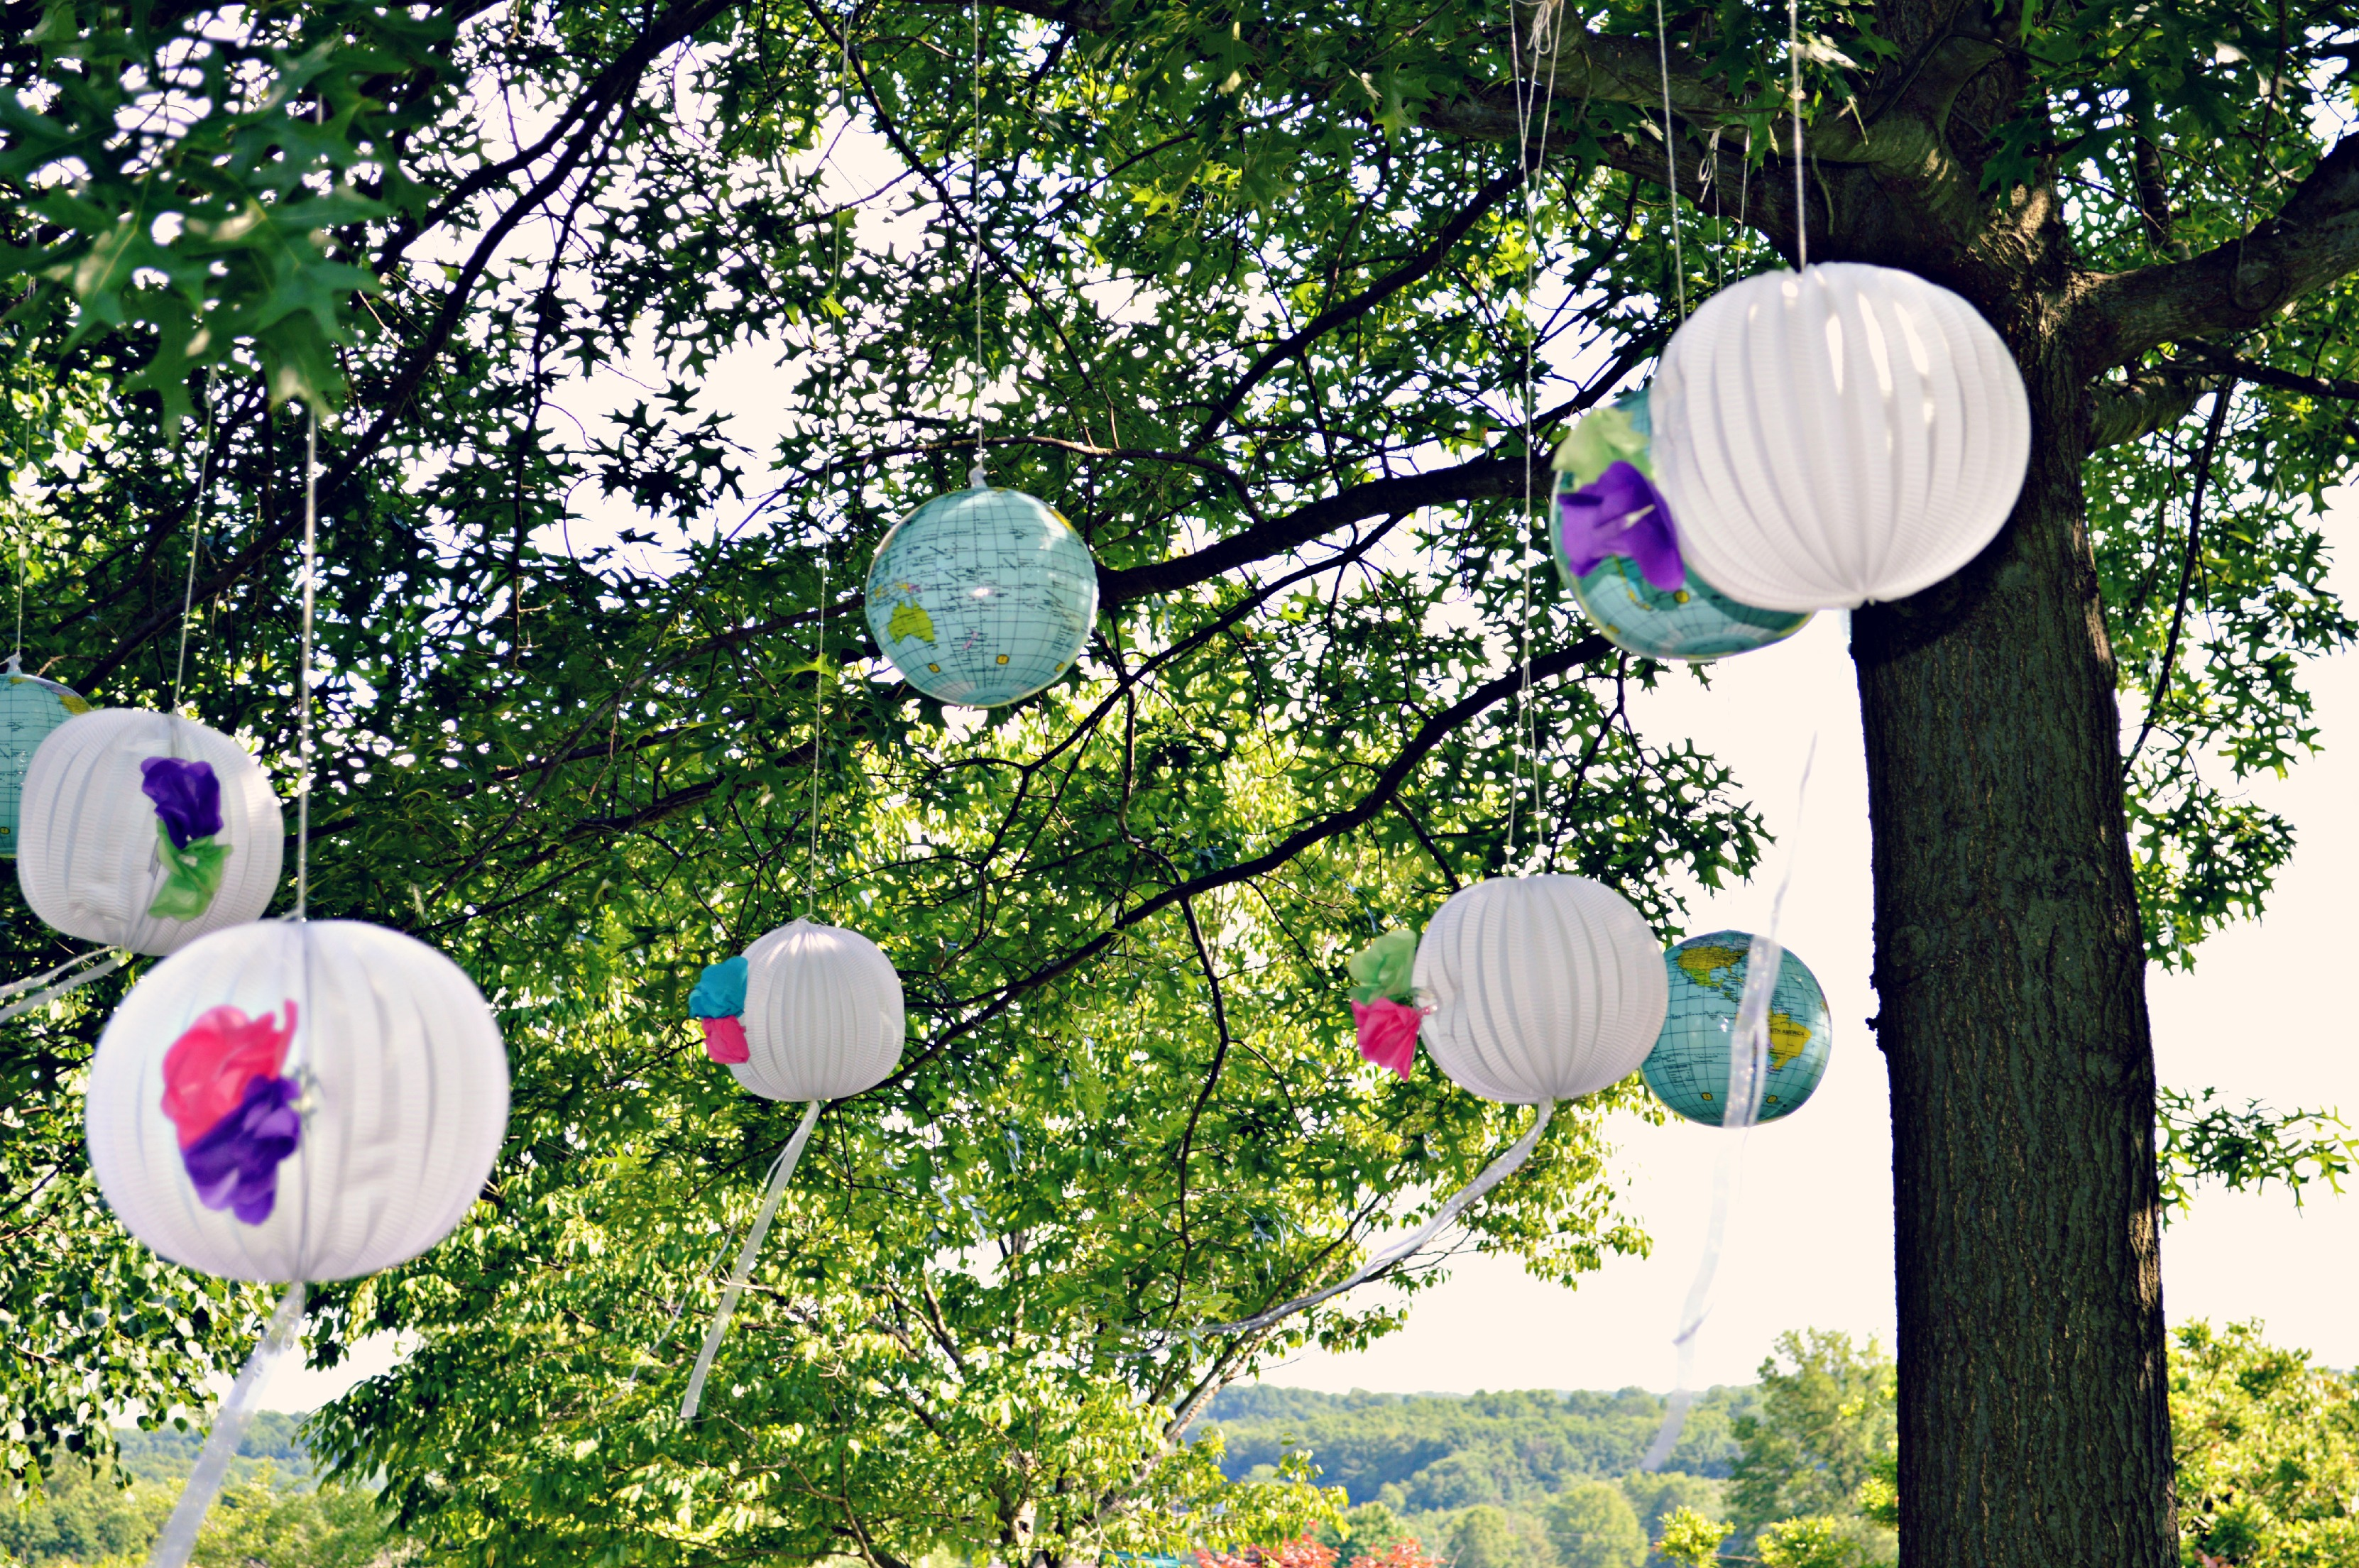 Diy Shower Decor Hanging Globes Lanterns Tissue Paper Flowers Some Kind Of Lovely Ride